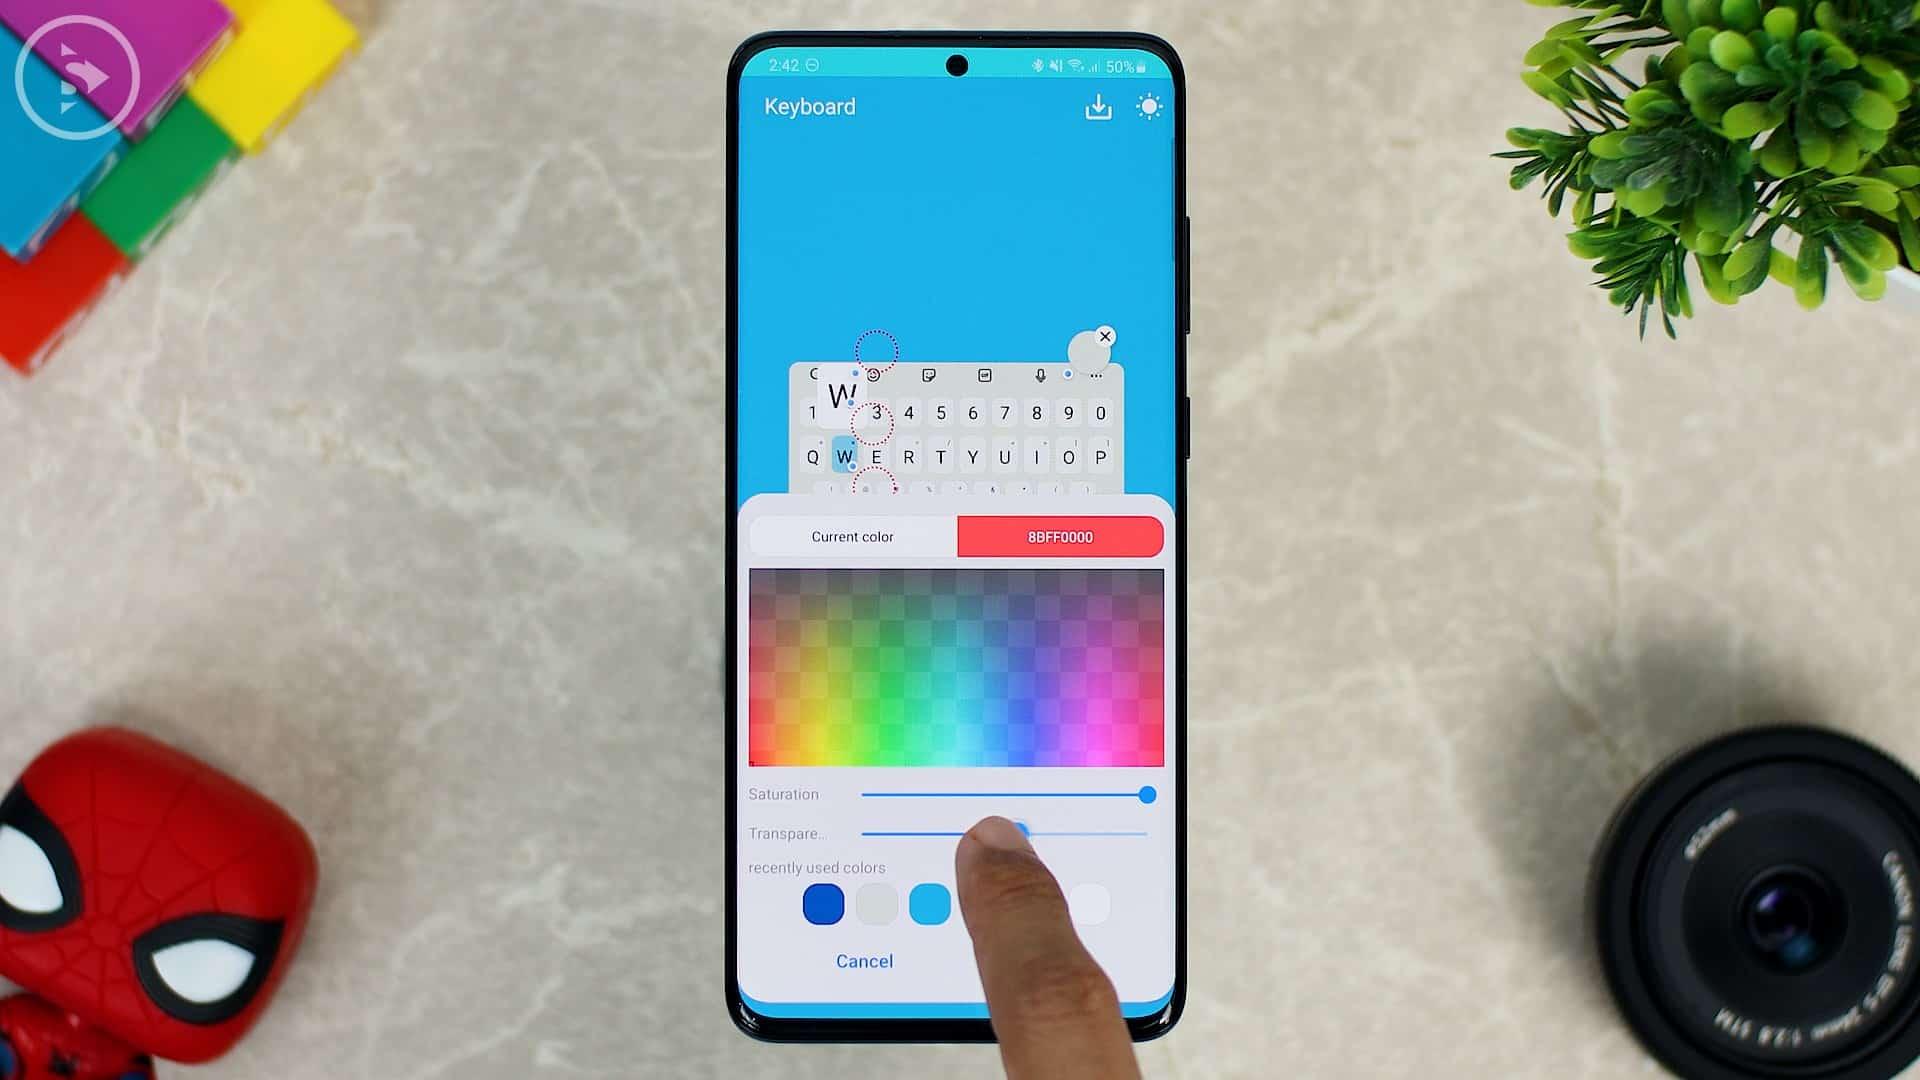 Cara Ganti Warna Keyboard di HP Samsung - Fitur Baru Good Lock - atur transparansi